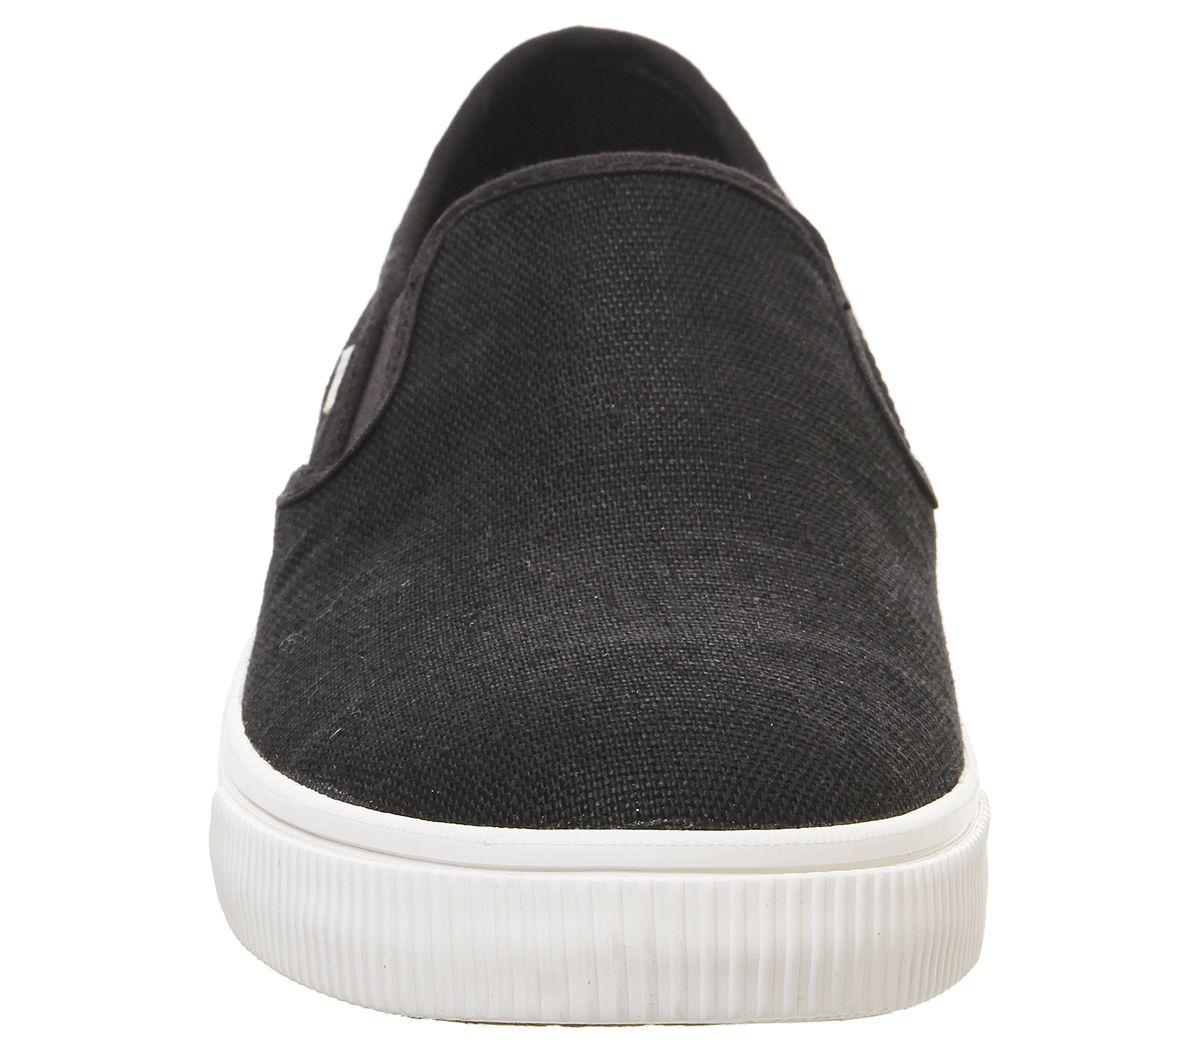 Da-Uomo-Toms-Baja-SLIP-ONS-Black-suola-bianca-scarpe-casual miniatura 3